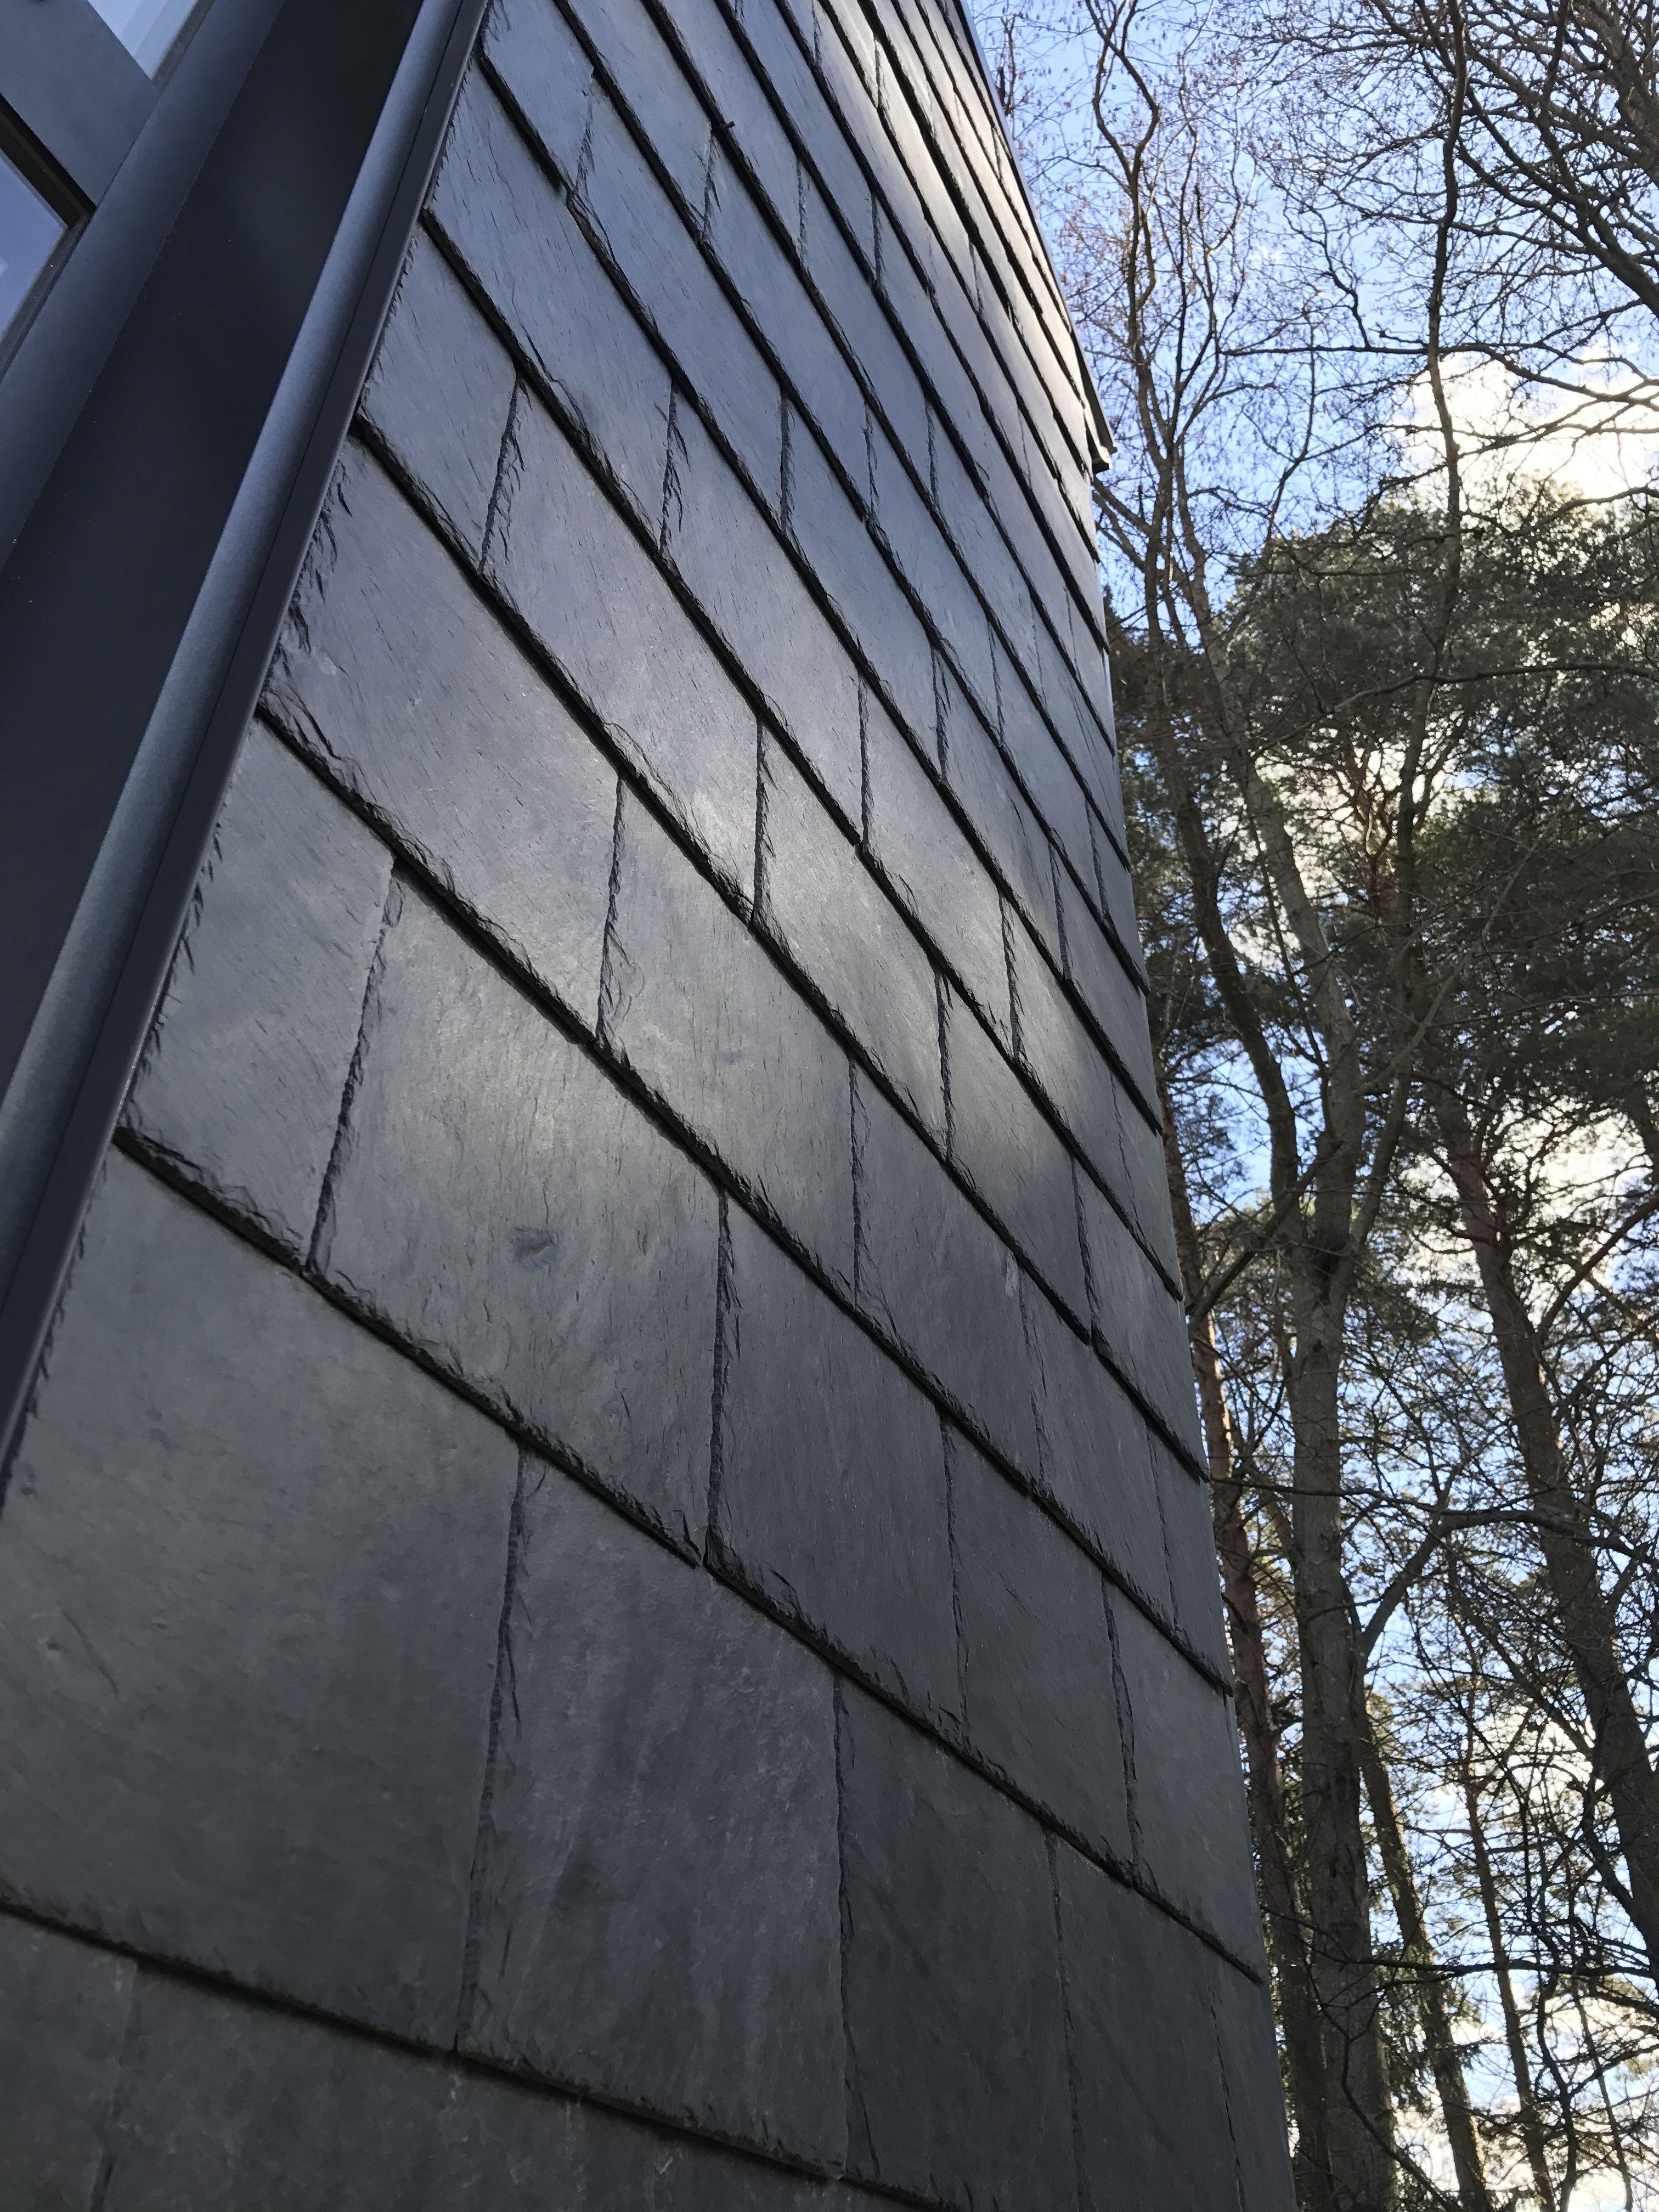 Slate Wall Cladding Wall Exterior Exterior Wall Cladding Wall Cladding